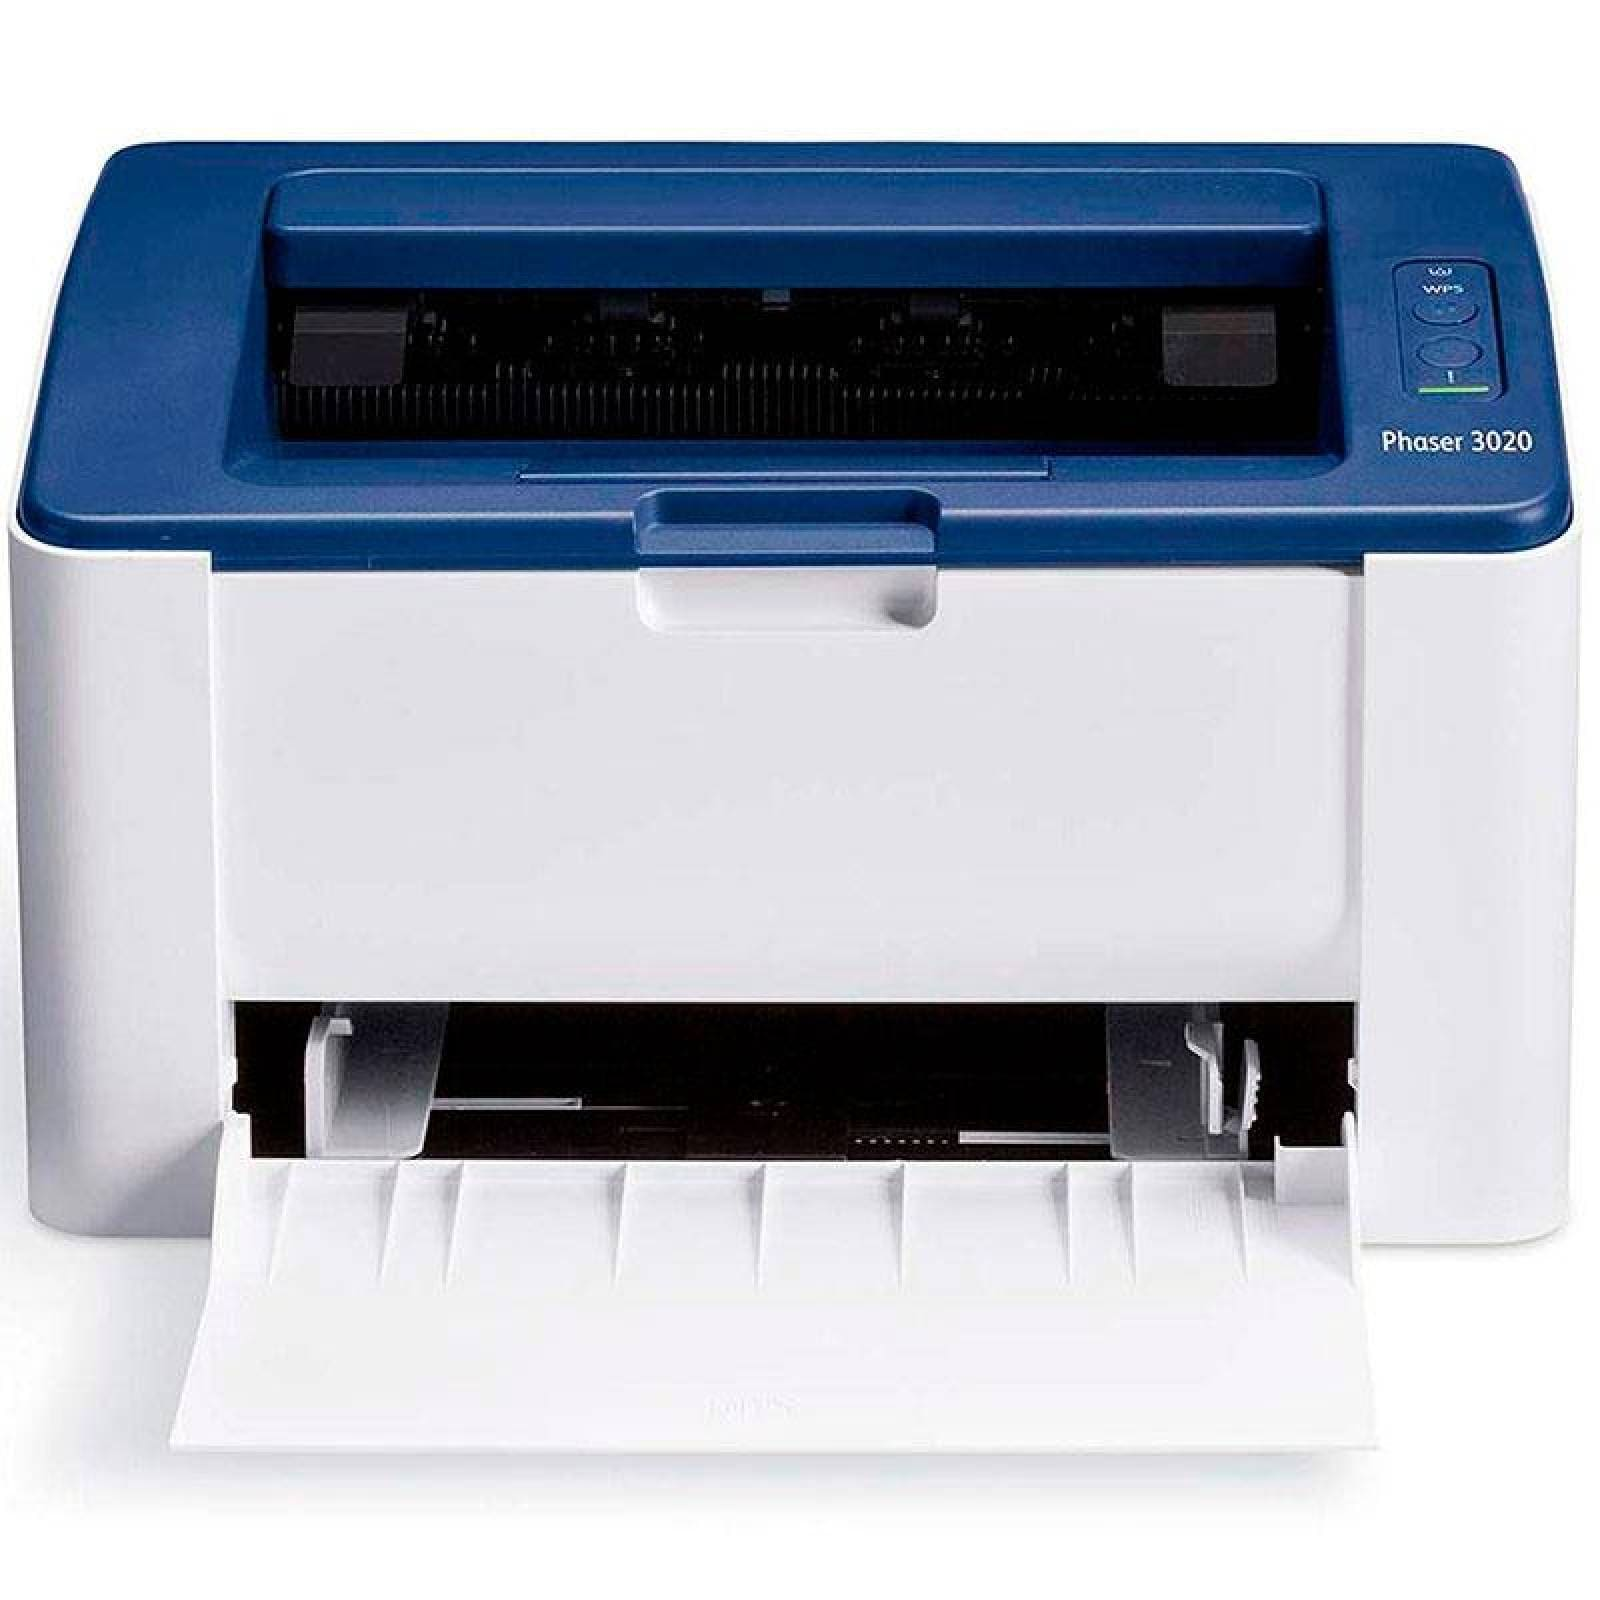 Impresora XEROX Phaser 3020 Laser Monocromatica 21ppm WiFi